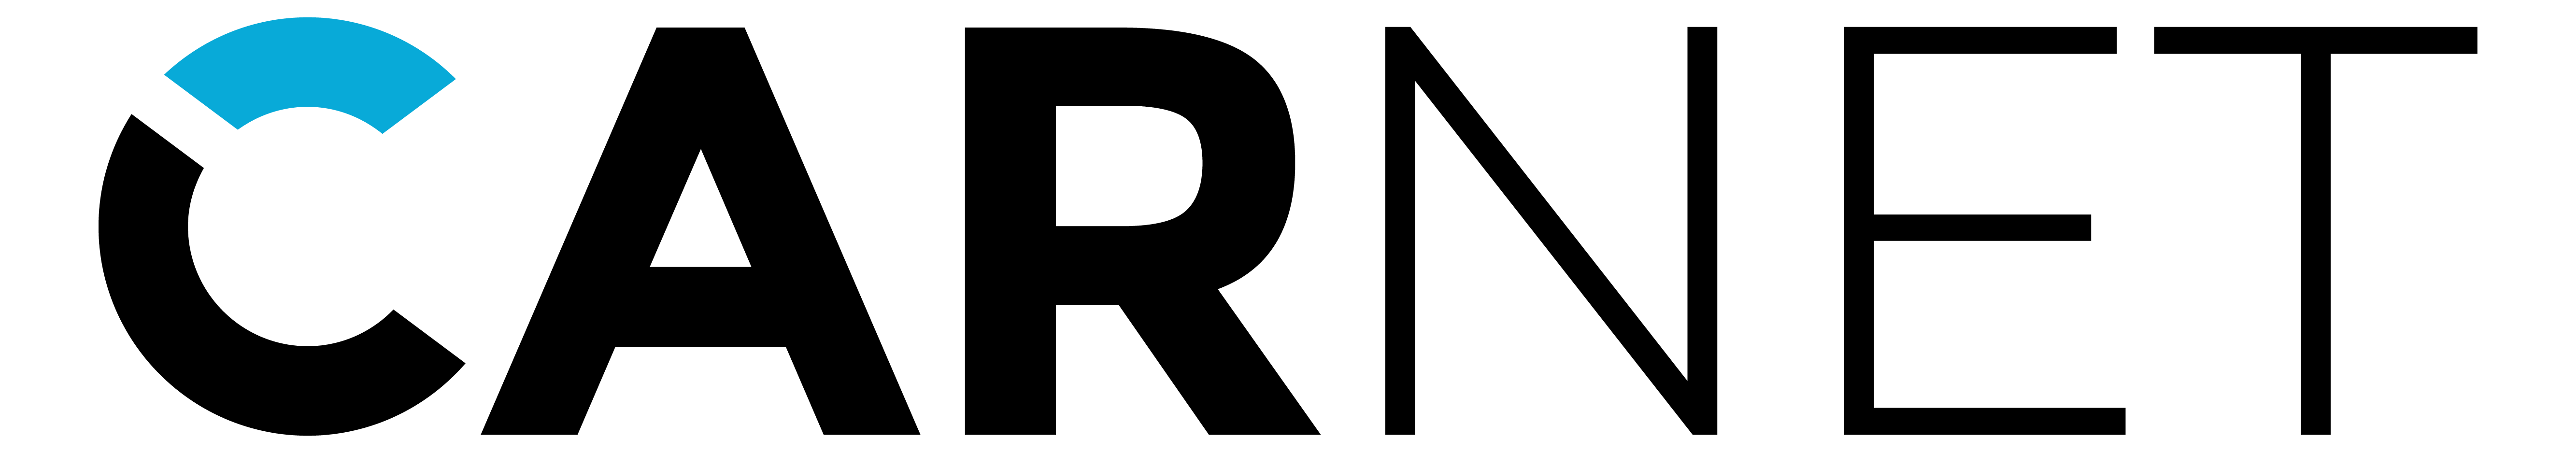 fraktálok bináris opciók